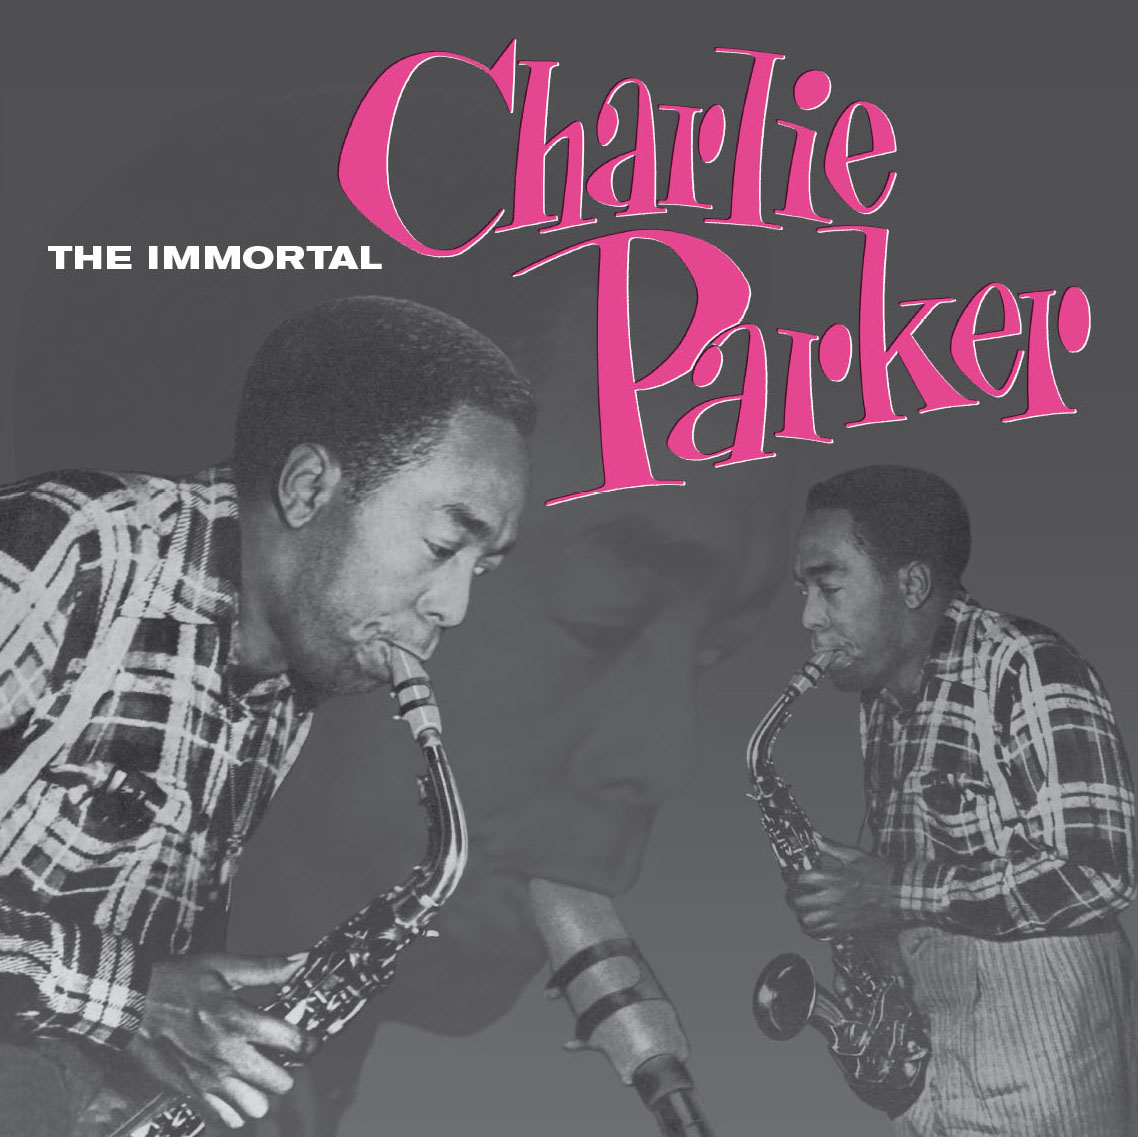 Charlie Parker/THE IMMORTAL (180g) LP